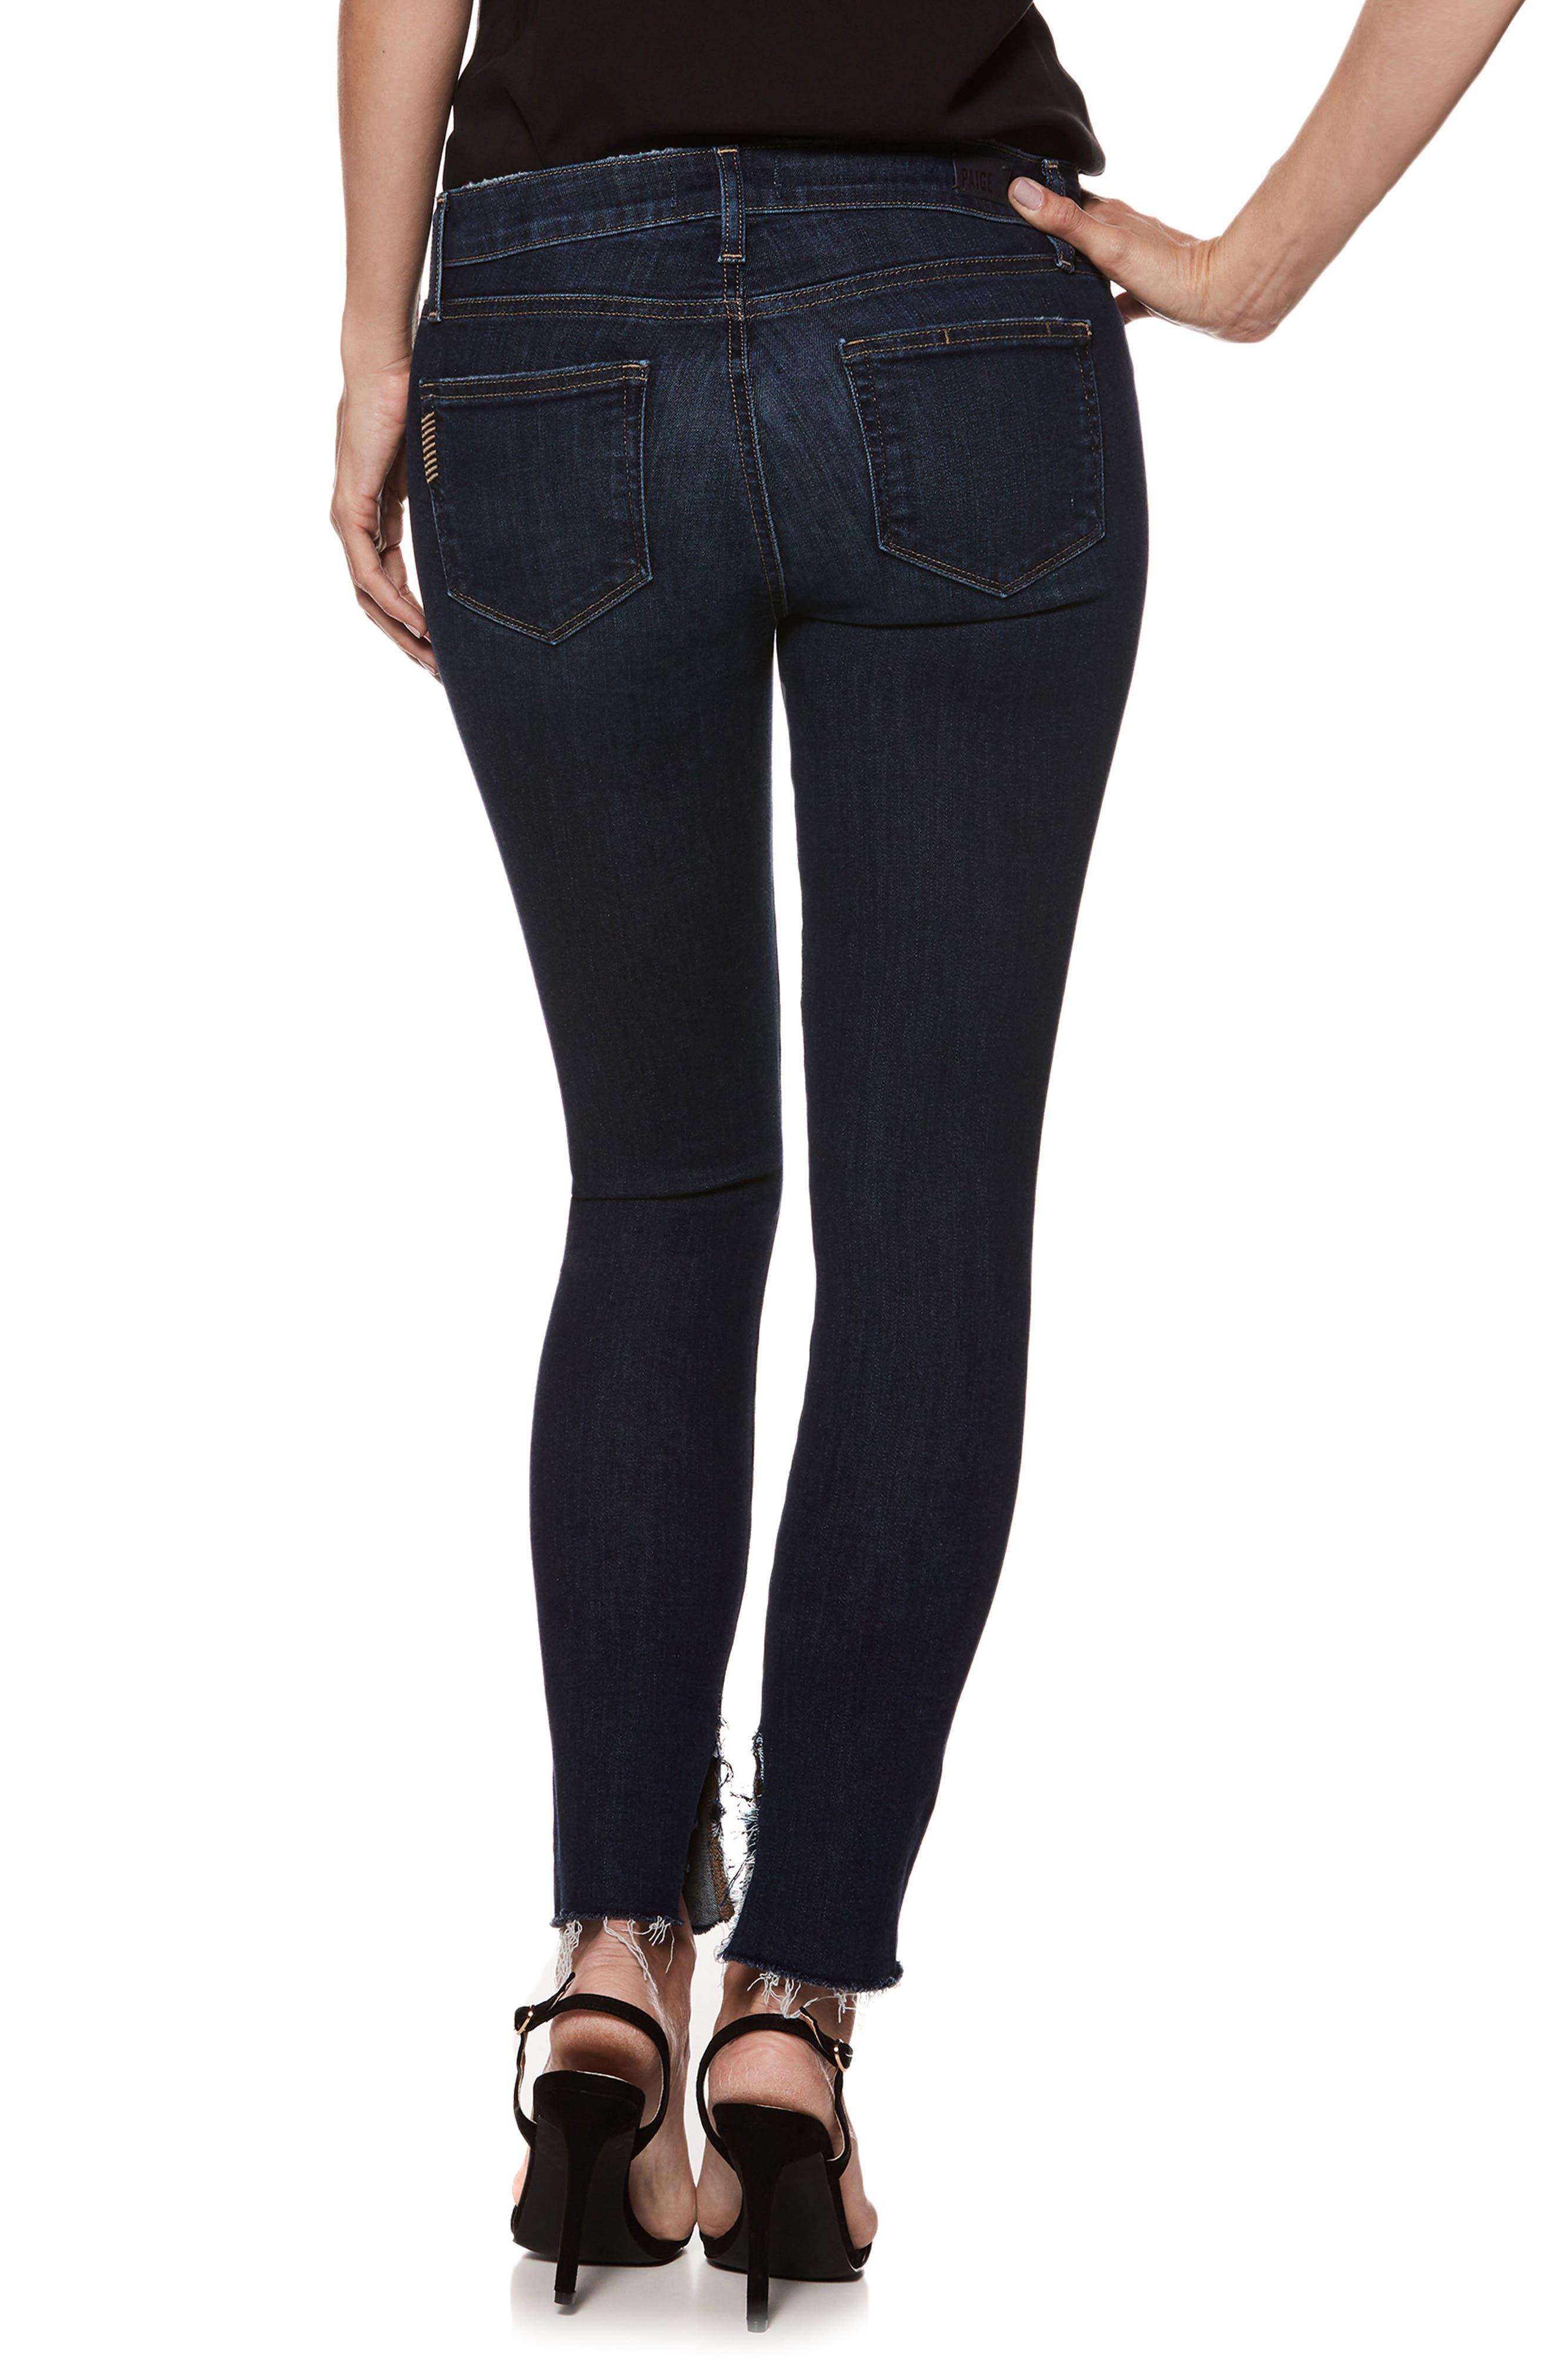 Transcend Vintage - Verdugo Ankle Ultra Skinny Jeans,                             Alternate thumbnail 2, color,                             Mazzetti